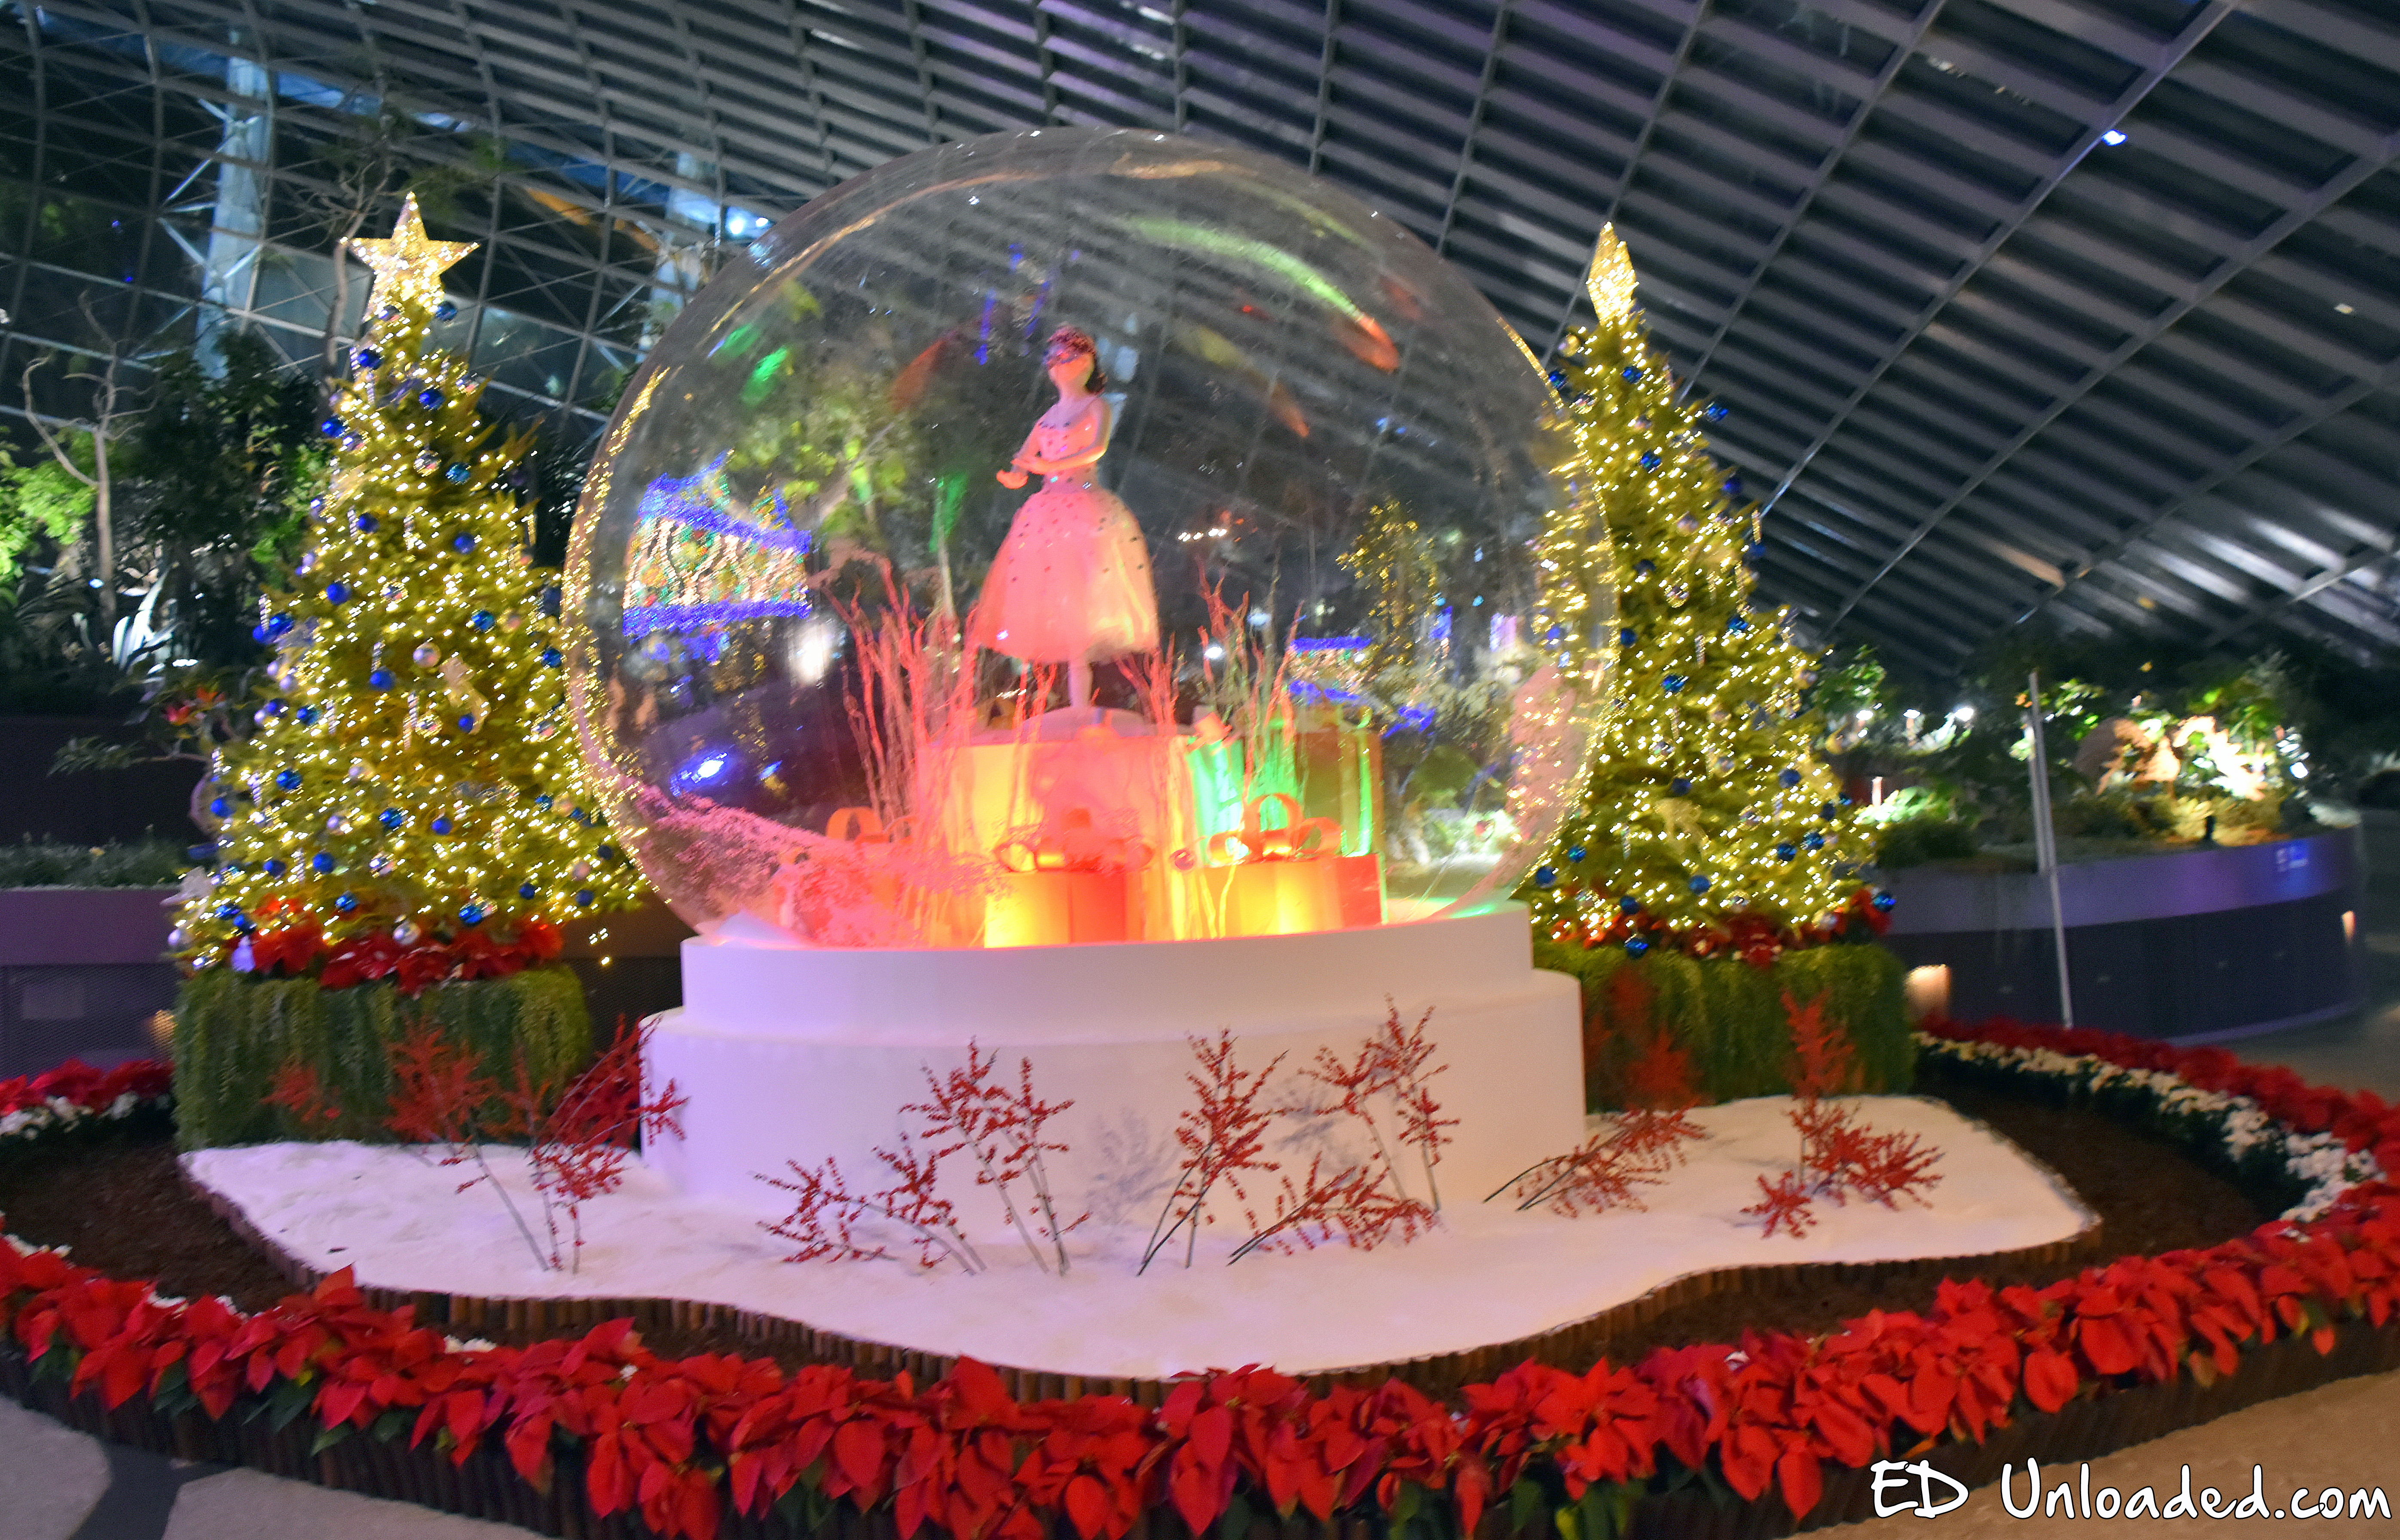 Gardens By The Bay Christmas Wonderland Ed Unloaded Com Parenting Lifestyle Travel Blog